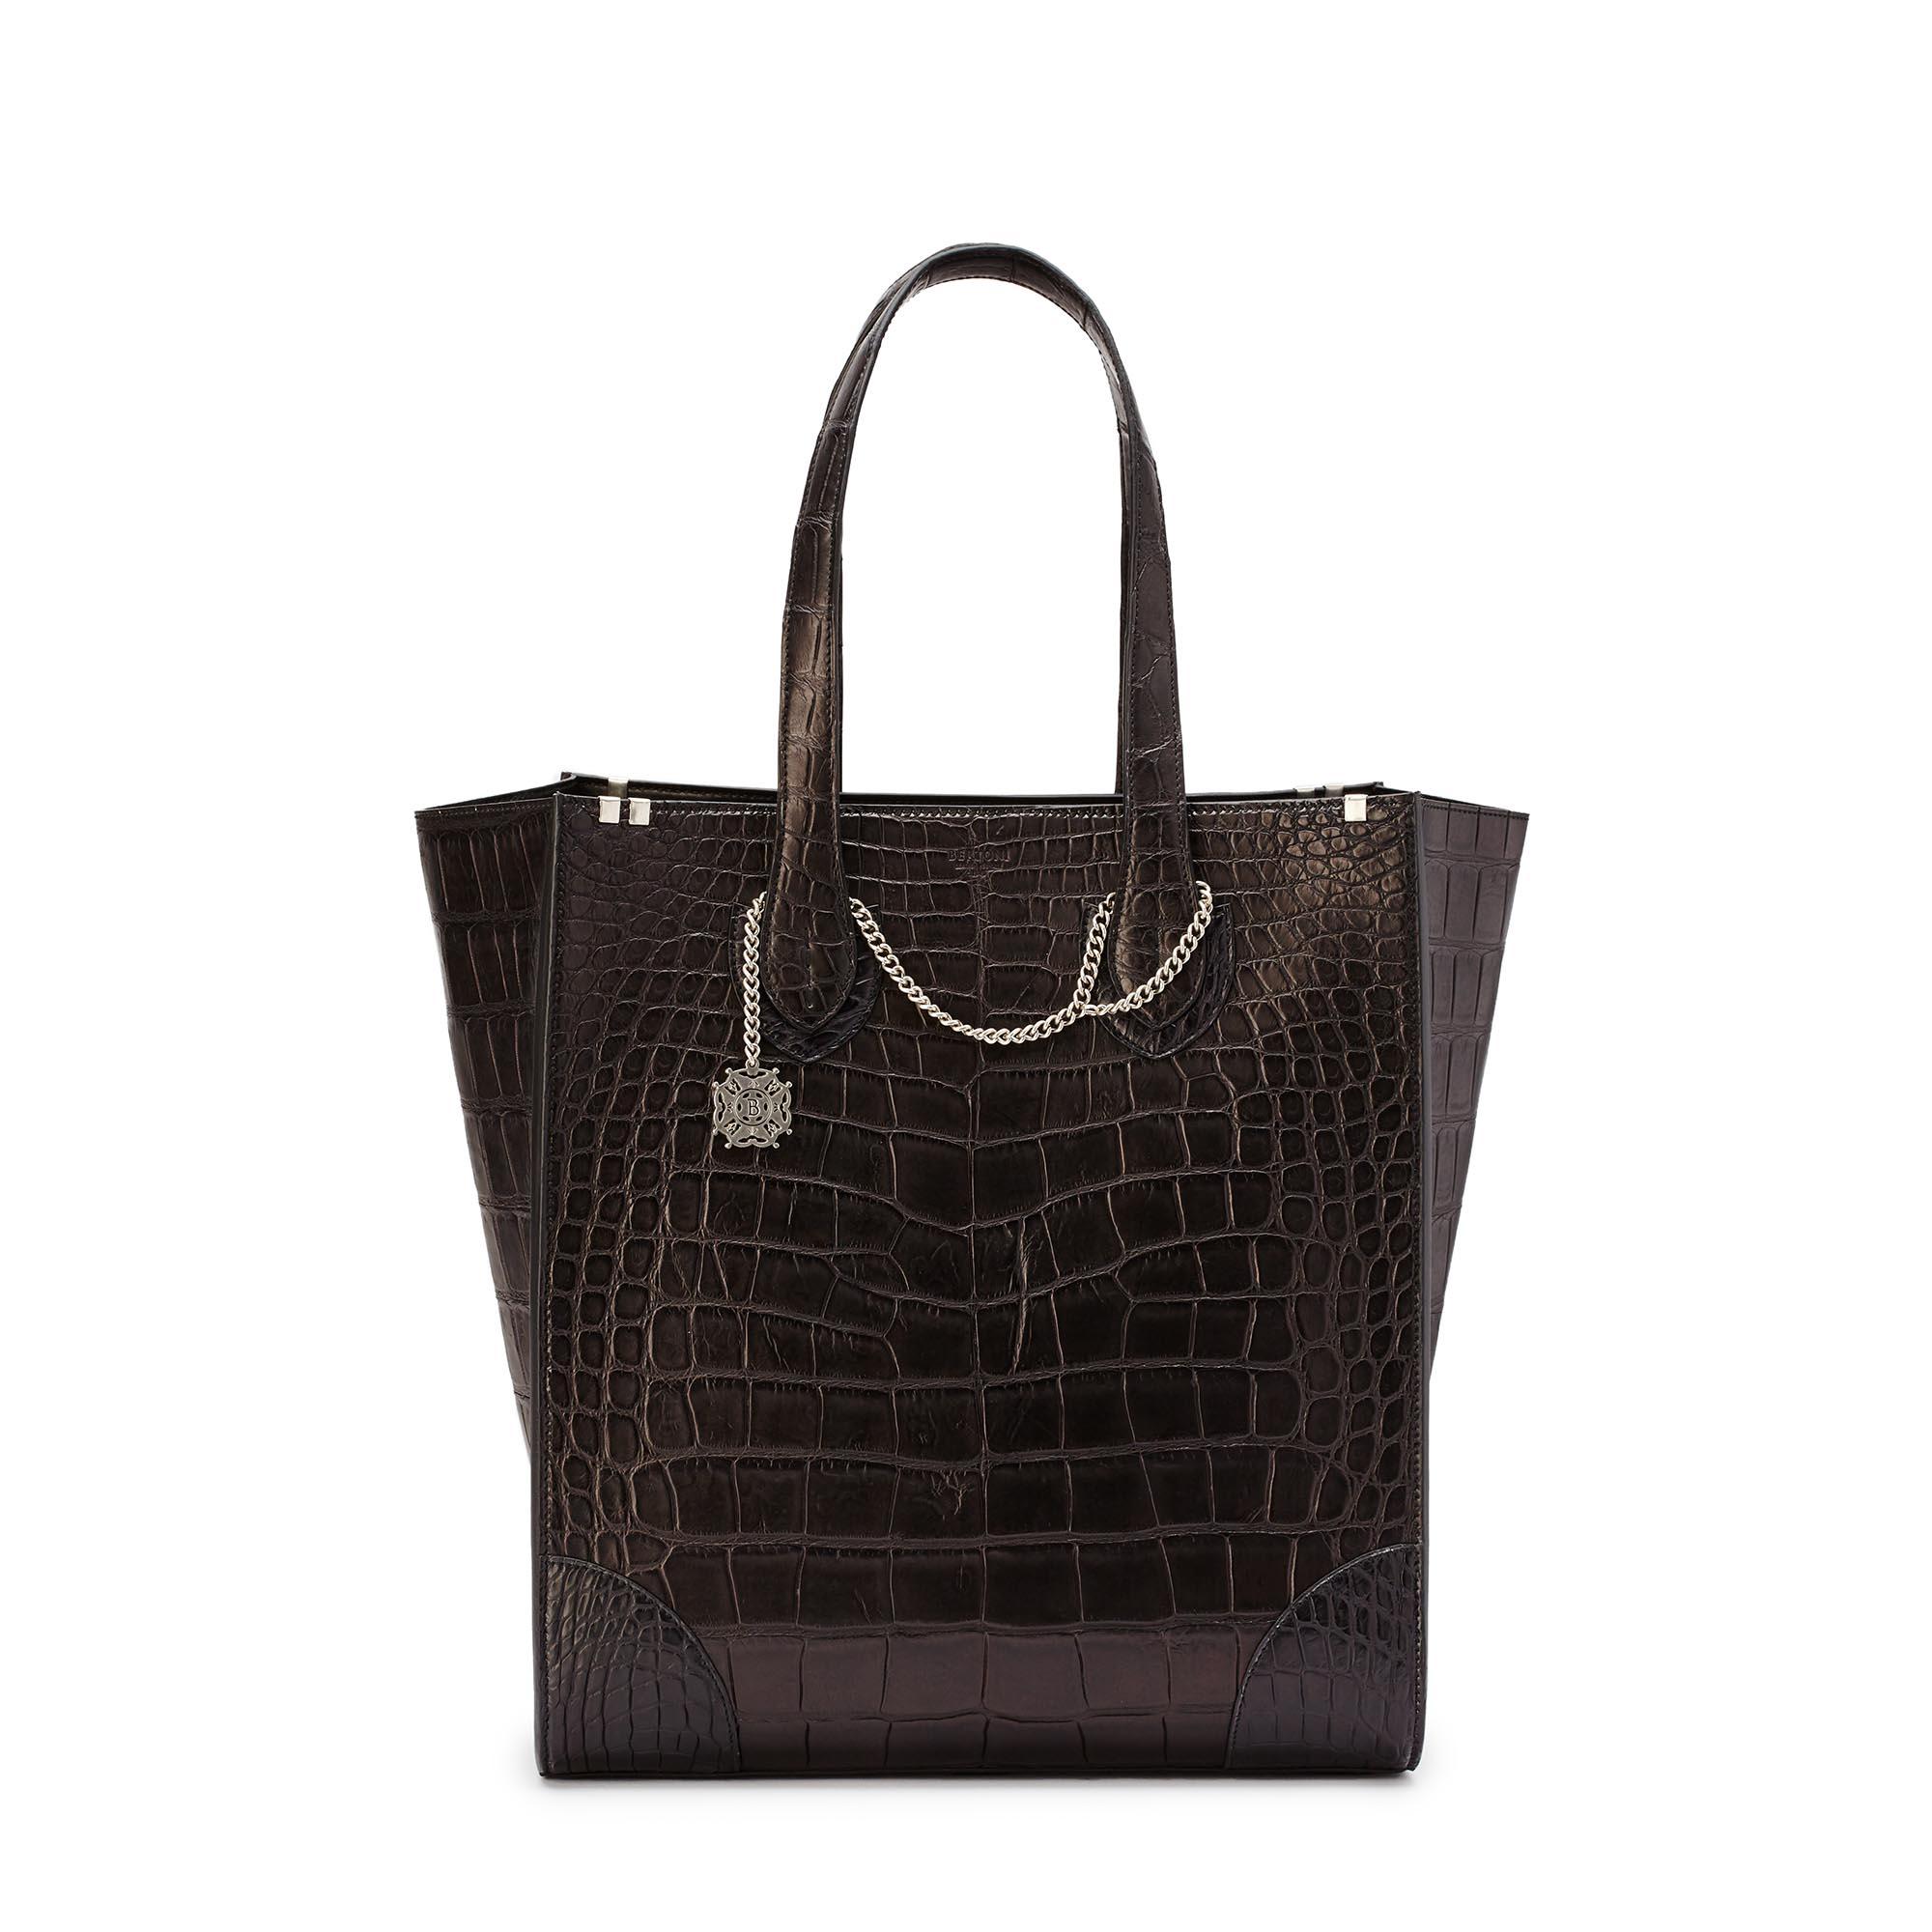 Signatura-Tote-black-alligator-bag-Bertoni-1949_01